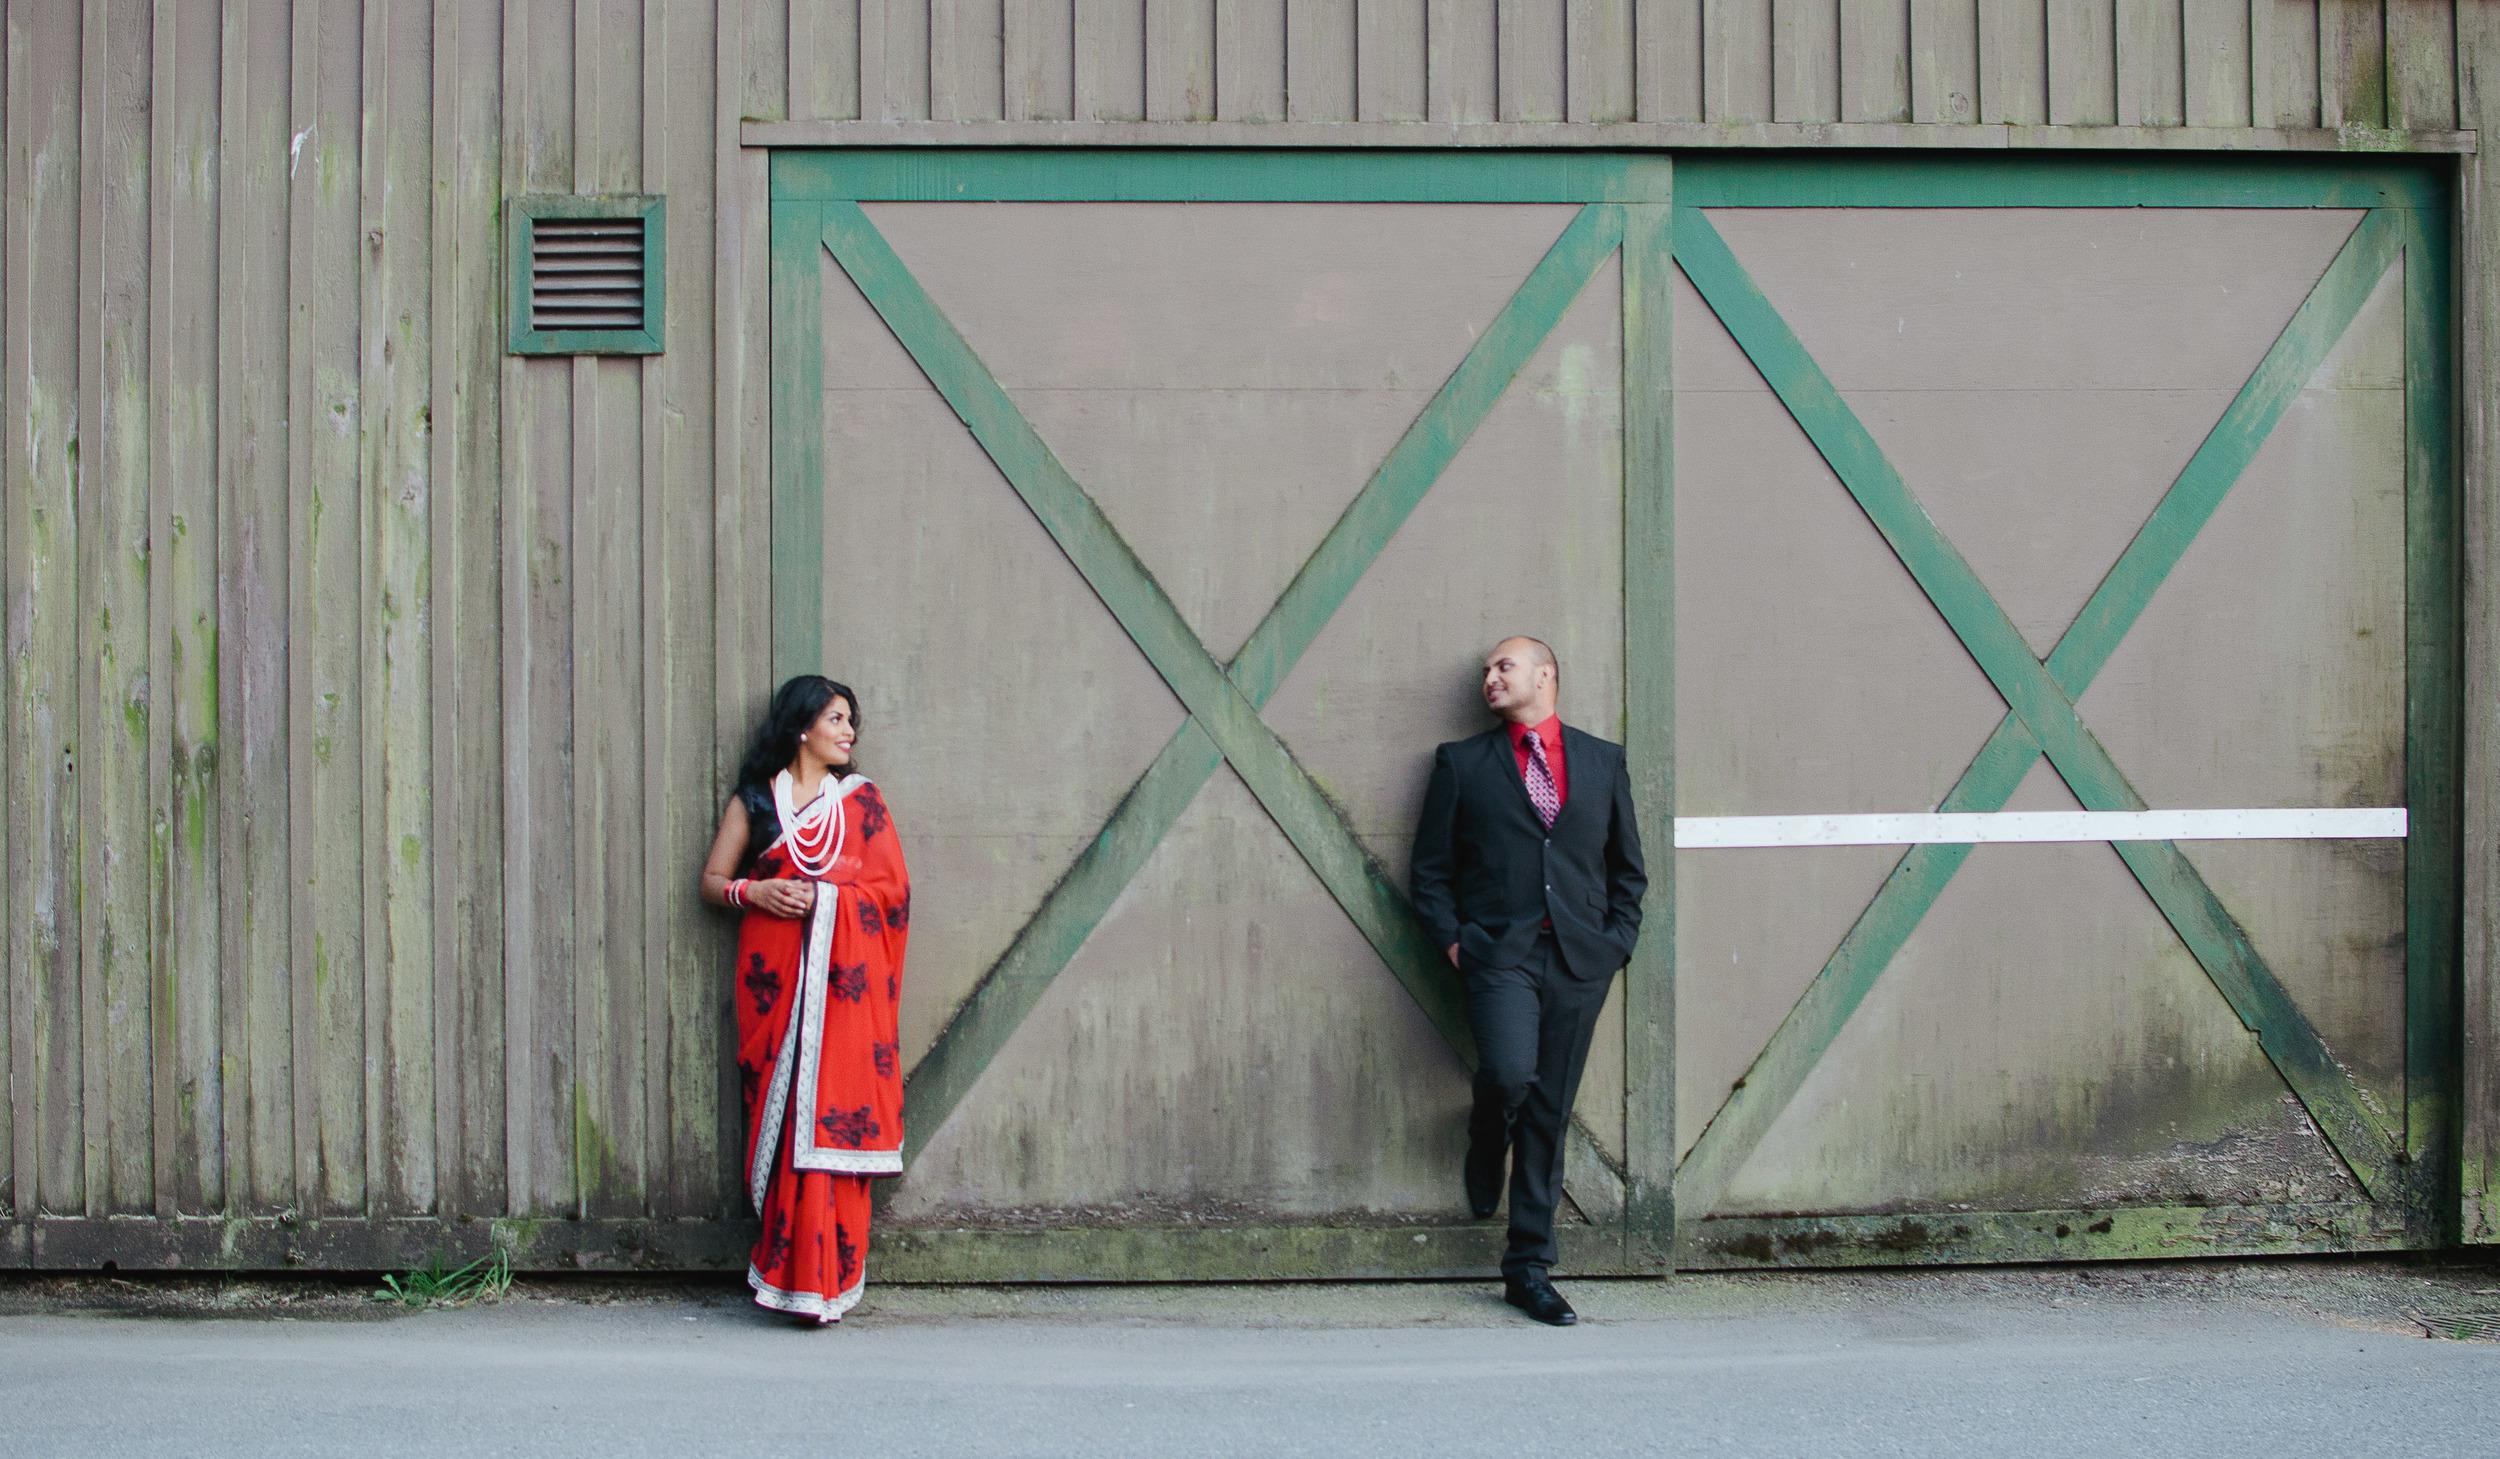 Amresh + Salona_Katie Powell Photography Vancouver Engagement Stanley Park Portraits-18.jpg